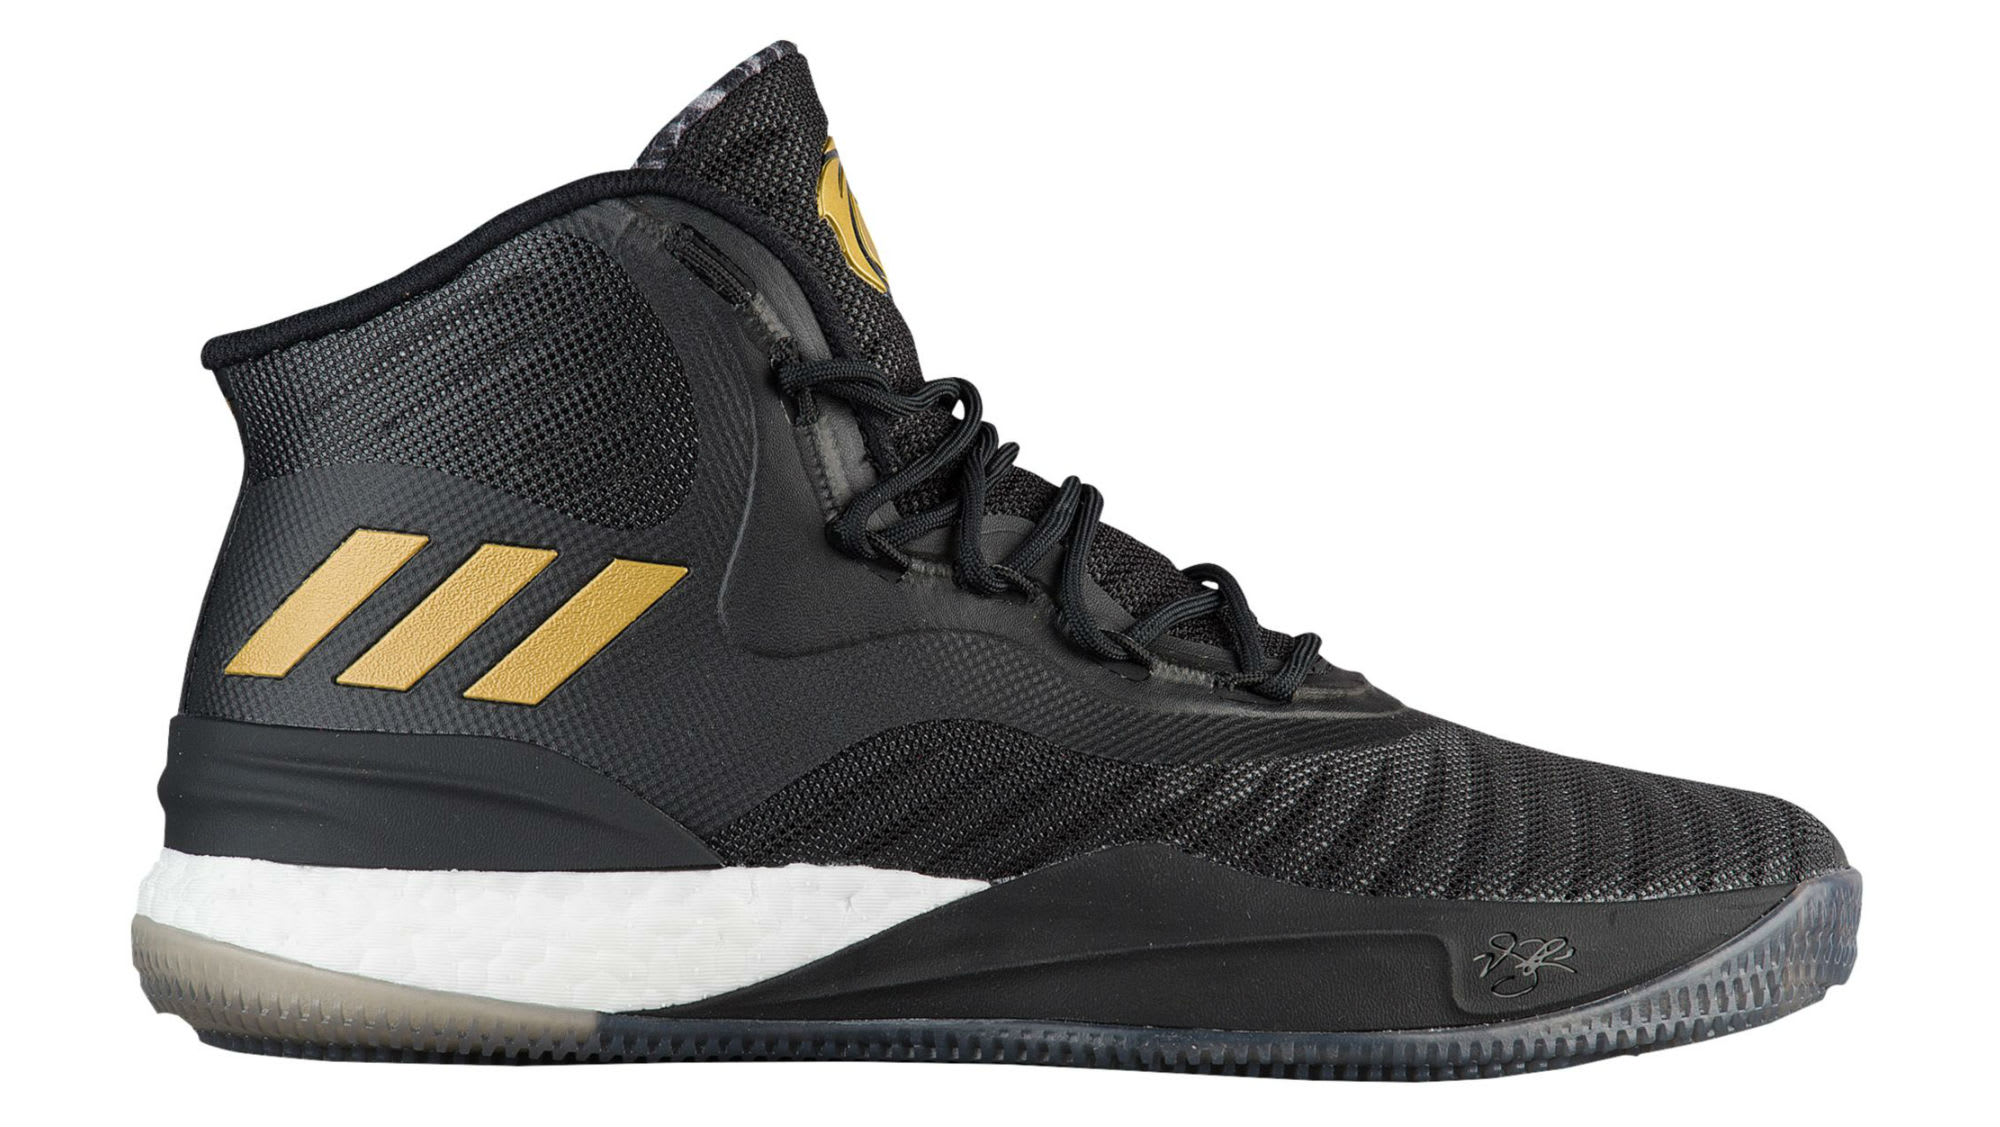 0a23f0b44241a ... inexpensive adidas d rose 8 black gold white release date cq1618 ac8d3  3d36d